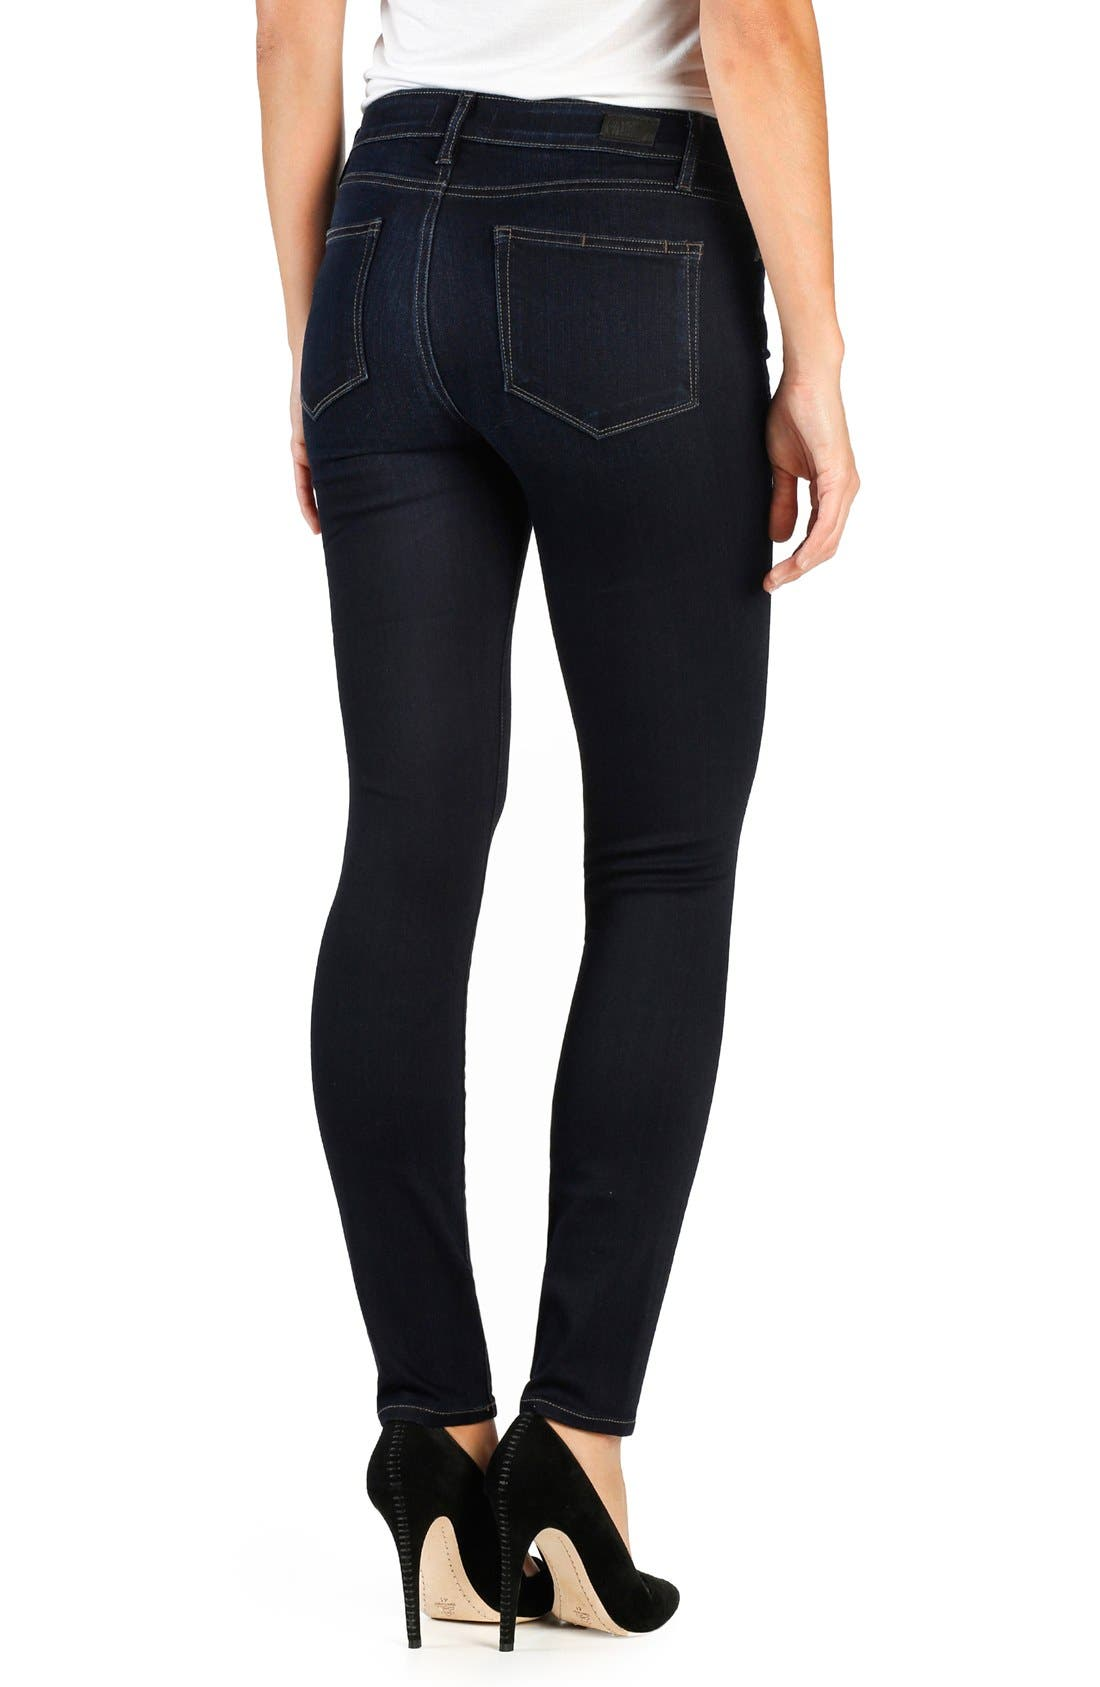 Transcend Verdugo Ankle Ultra Skinny Jeans,                             Alternate thumbnail 6, color,                             ELLORA